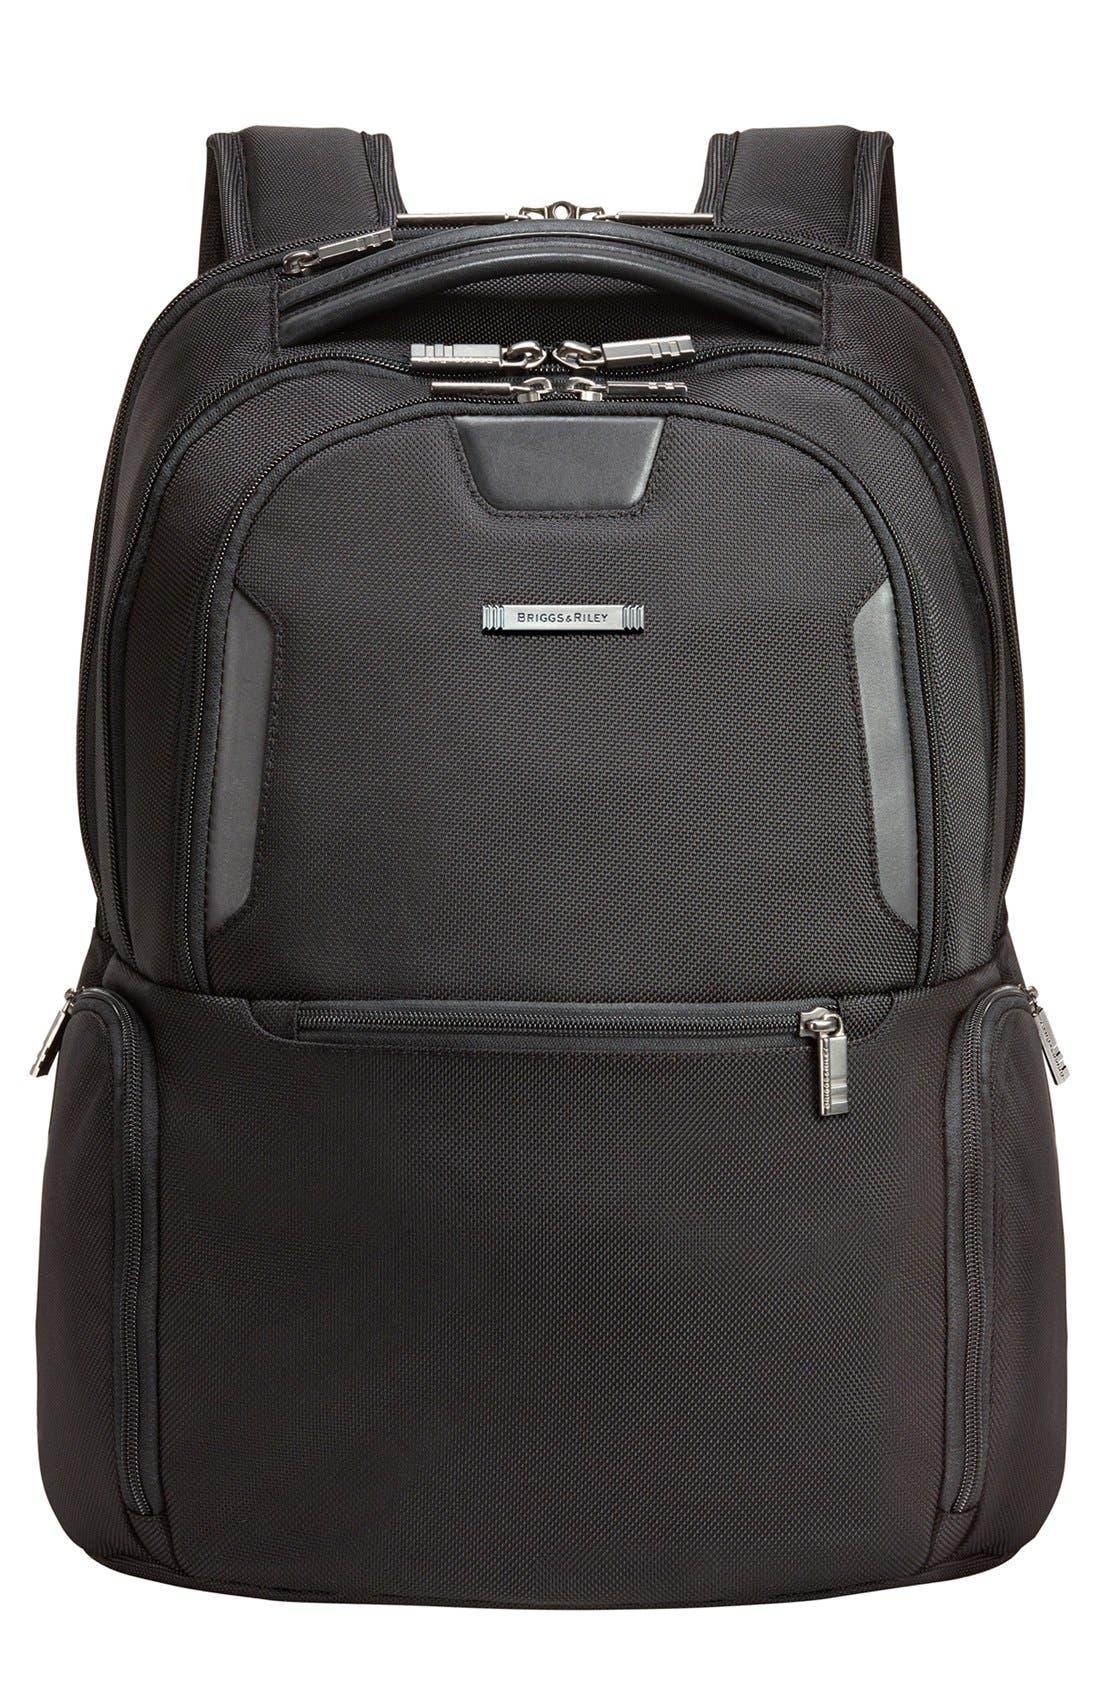 @work - Medium Backpack,                             Main thumbnail 1, color,                             004